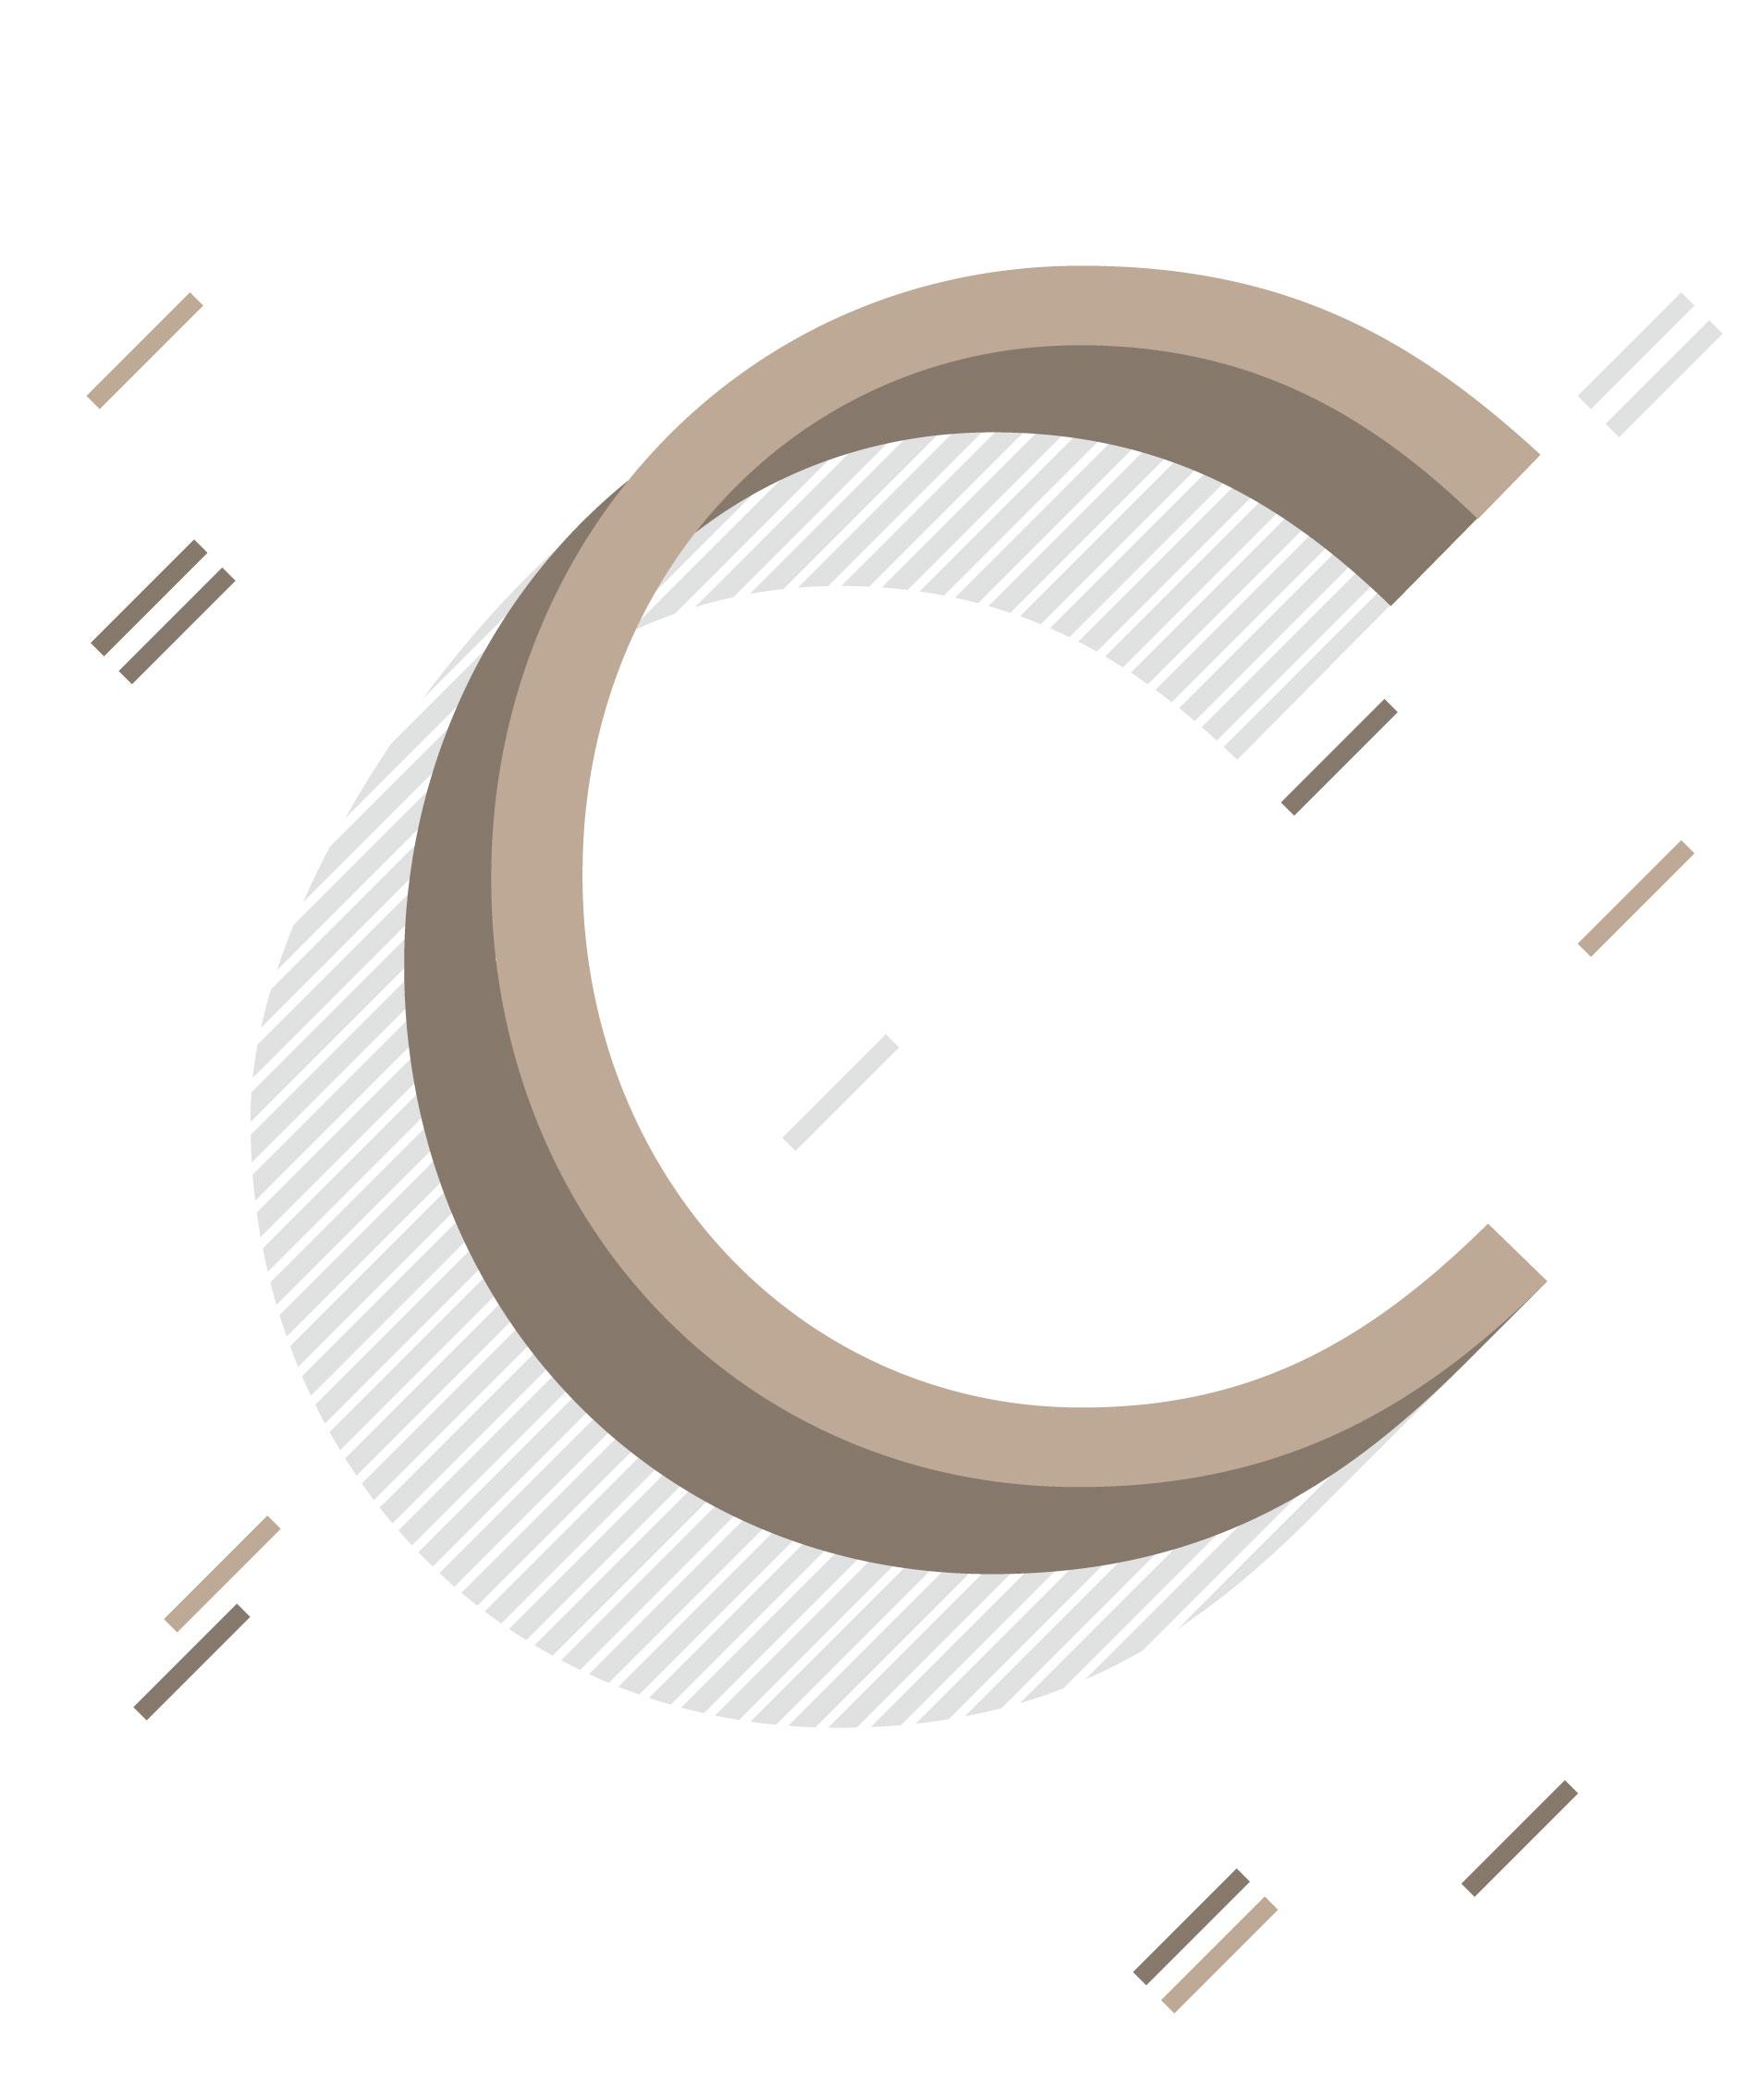 lettre_c.jpg